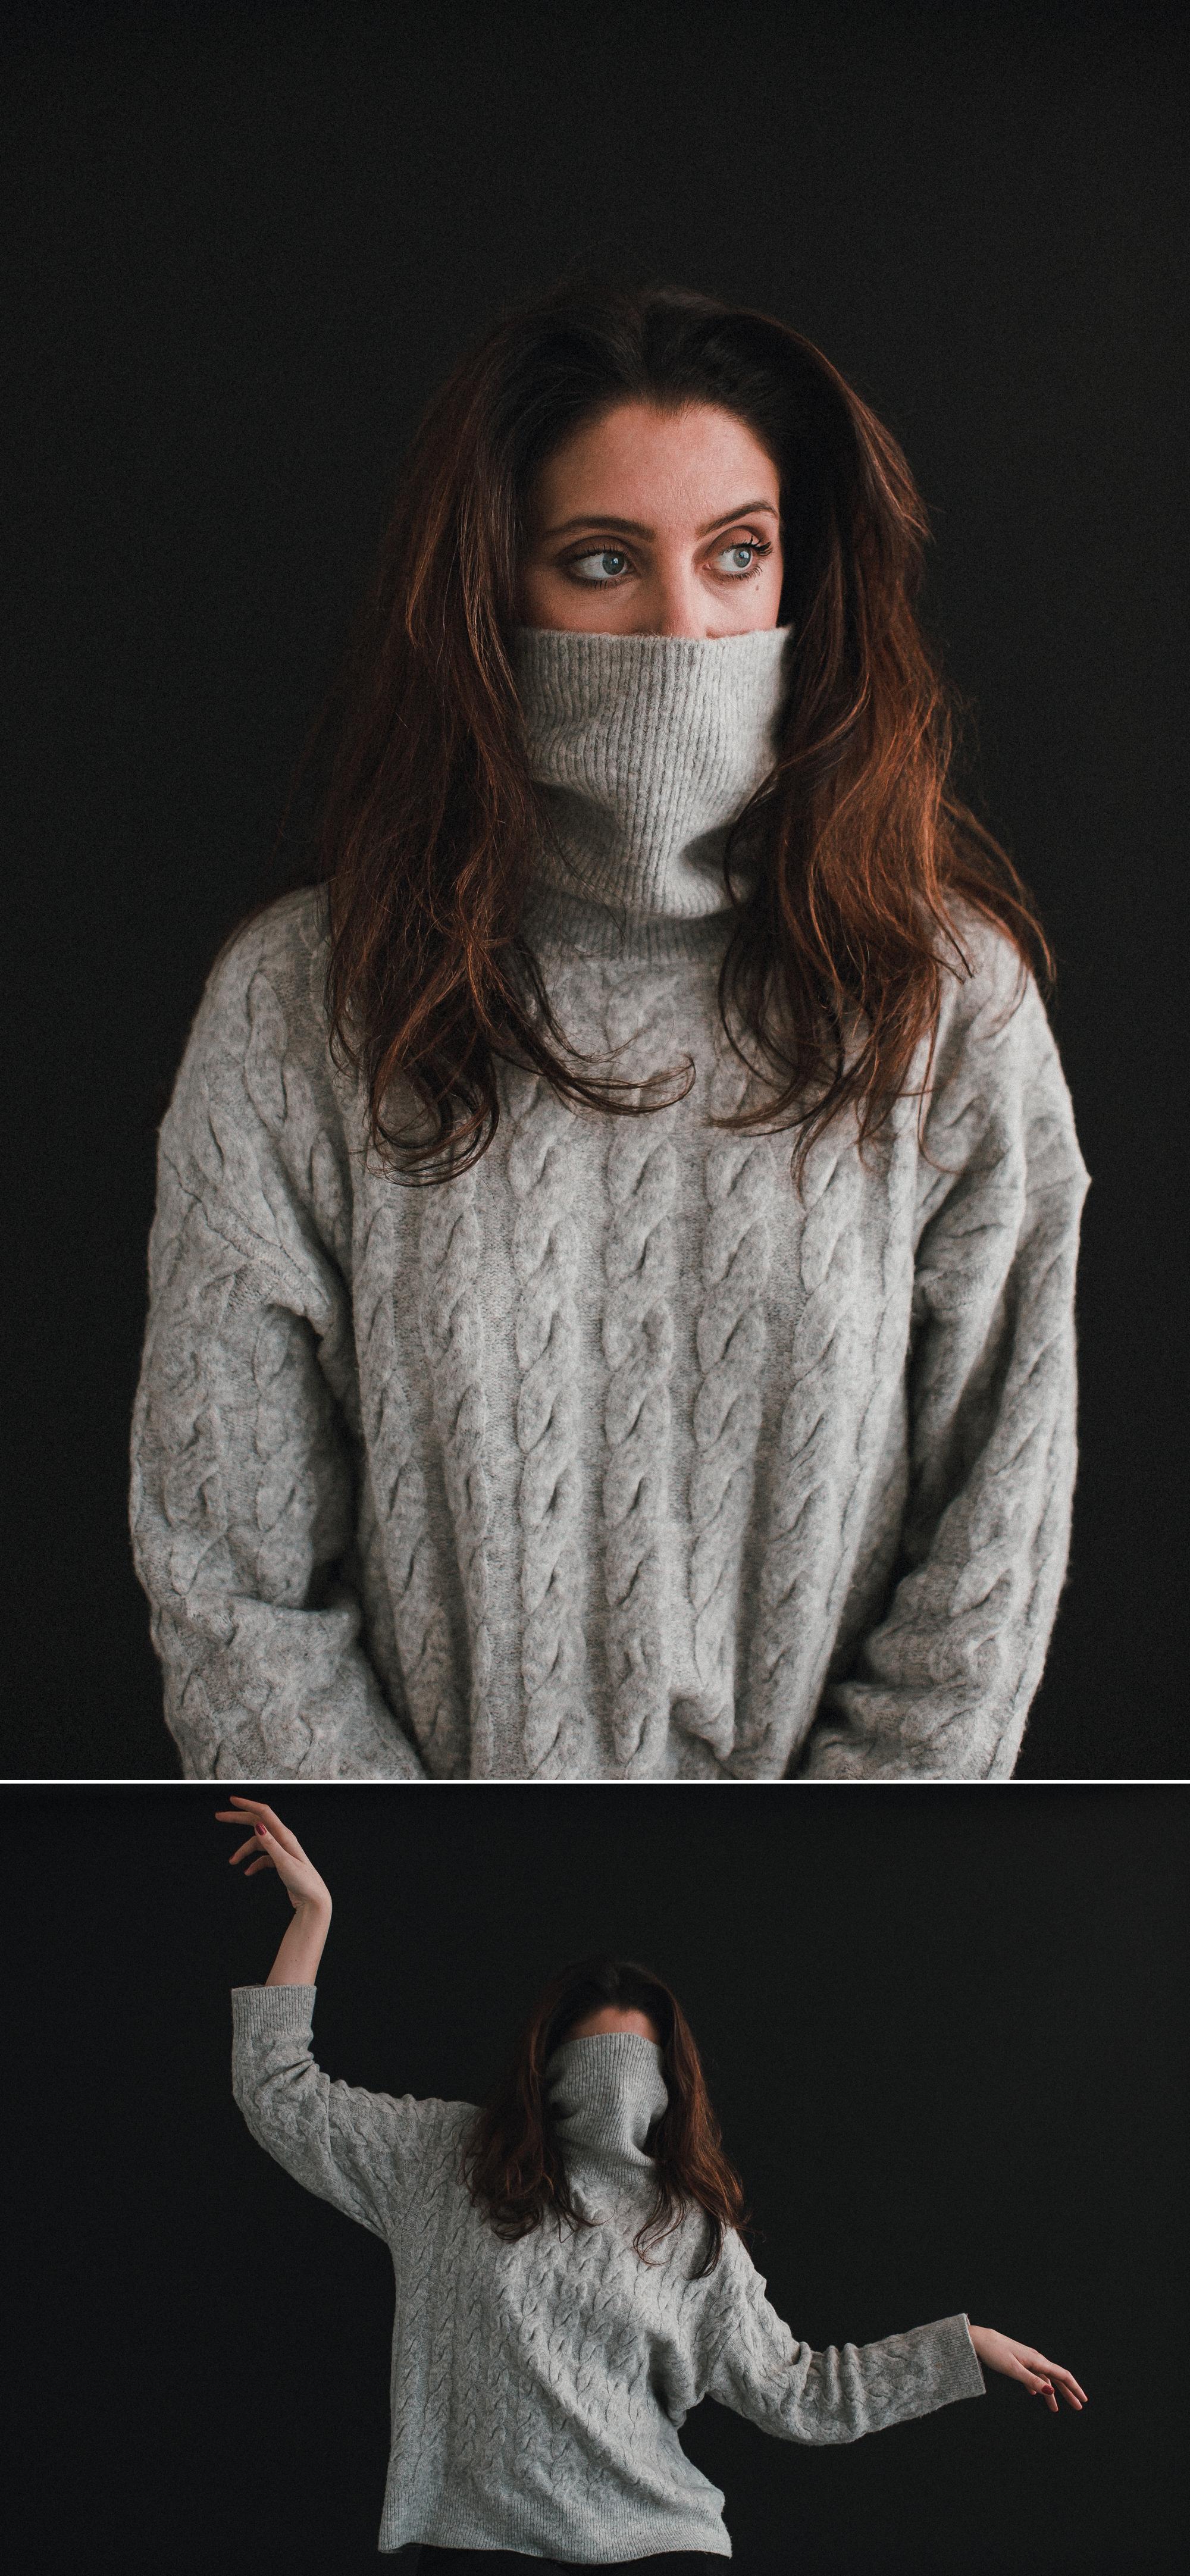 lifestyle-fashion-studio-portrait 9.jpg